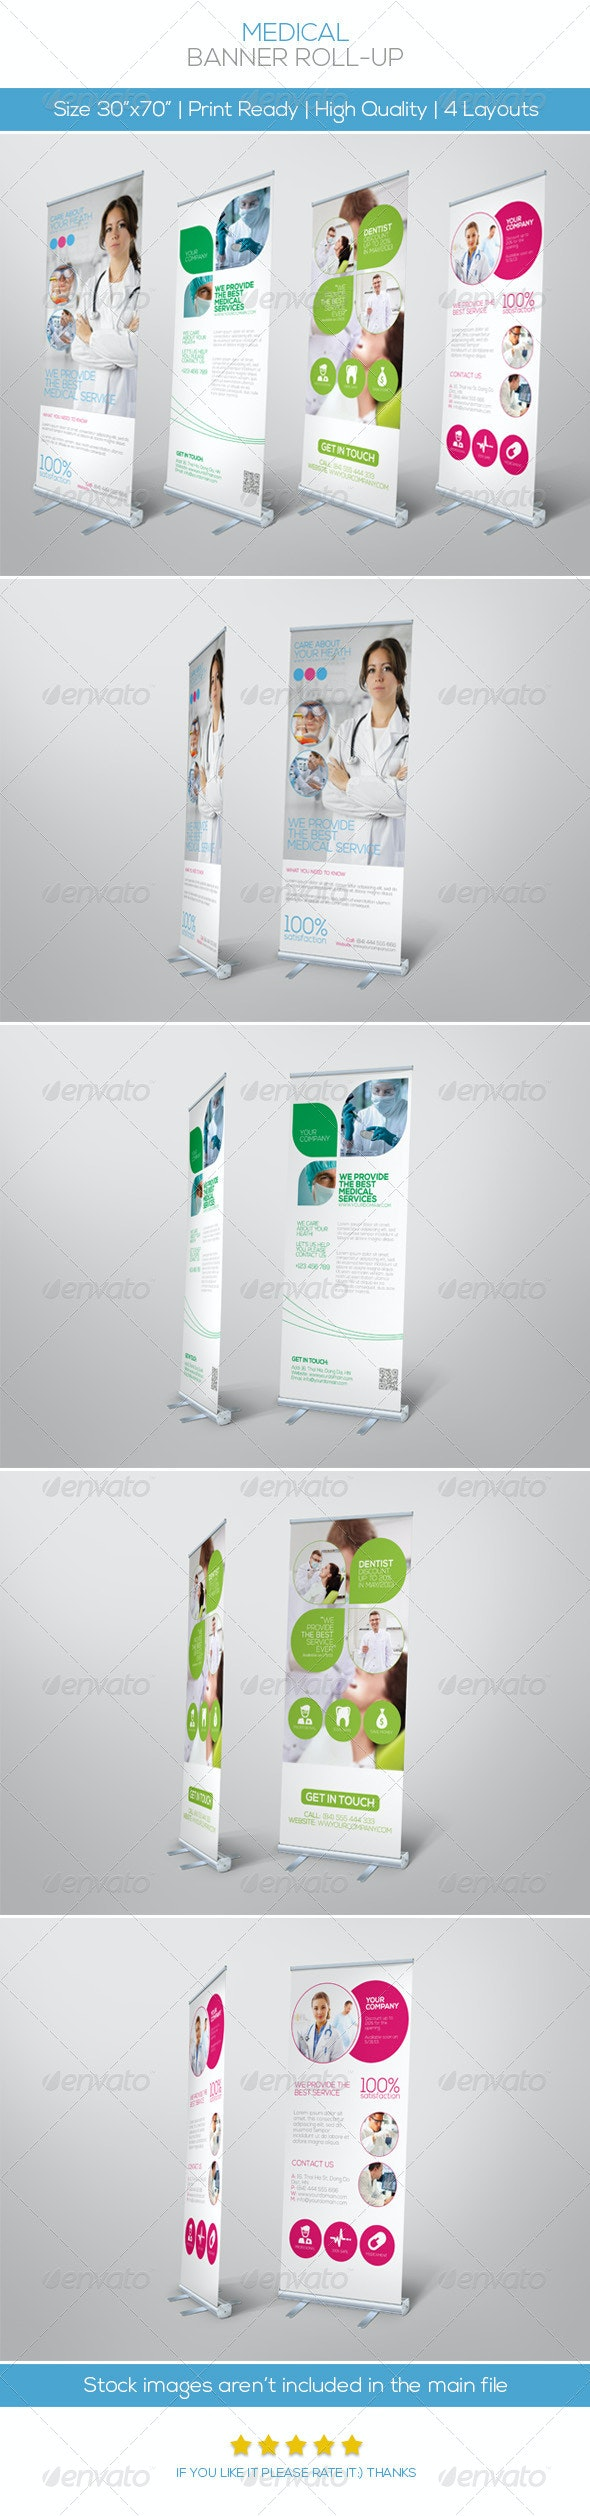 Premium Medical Roll-up Banner - Signage Print Templates